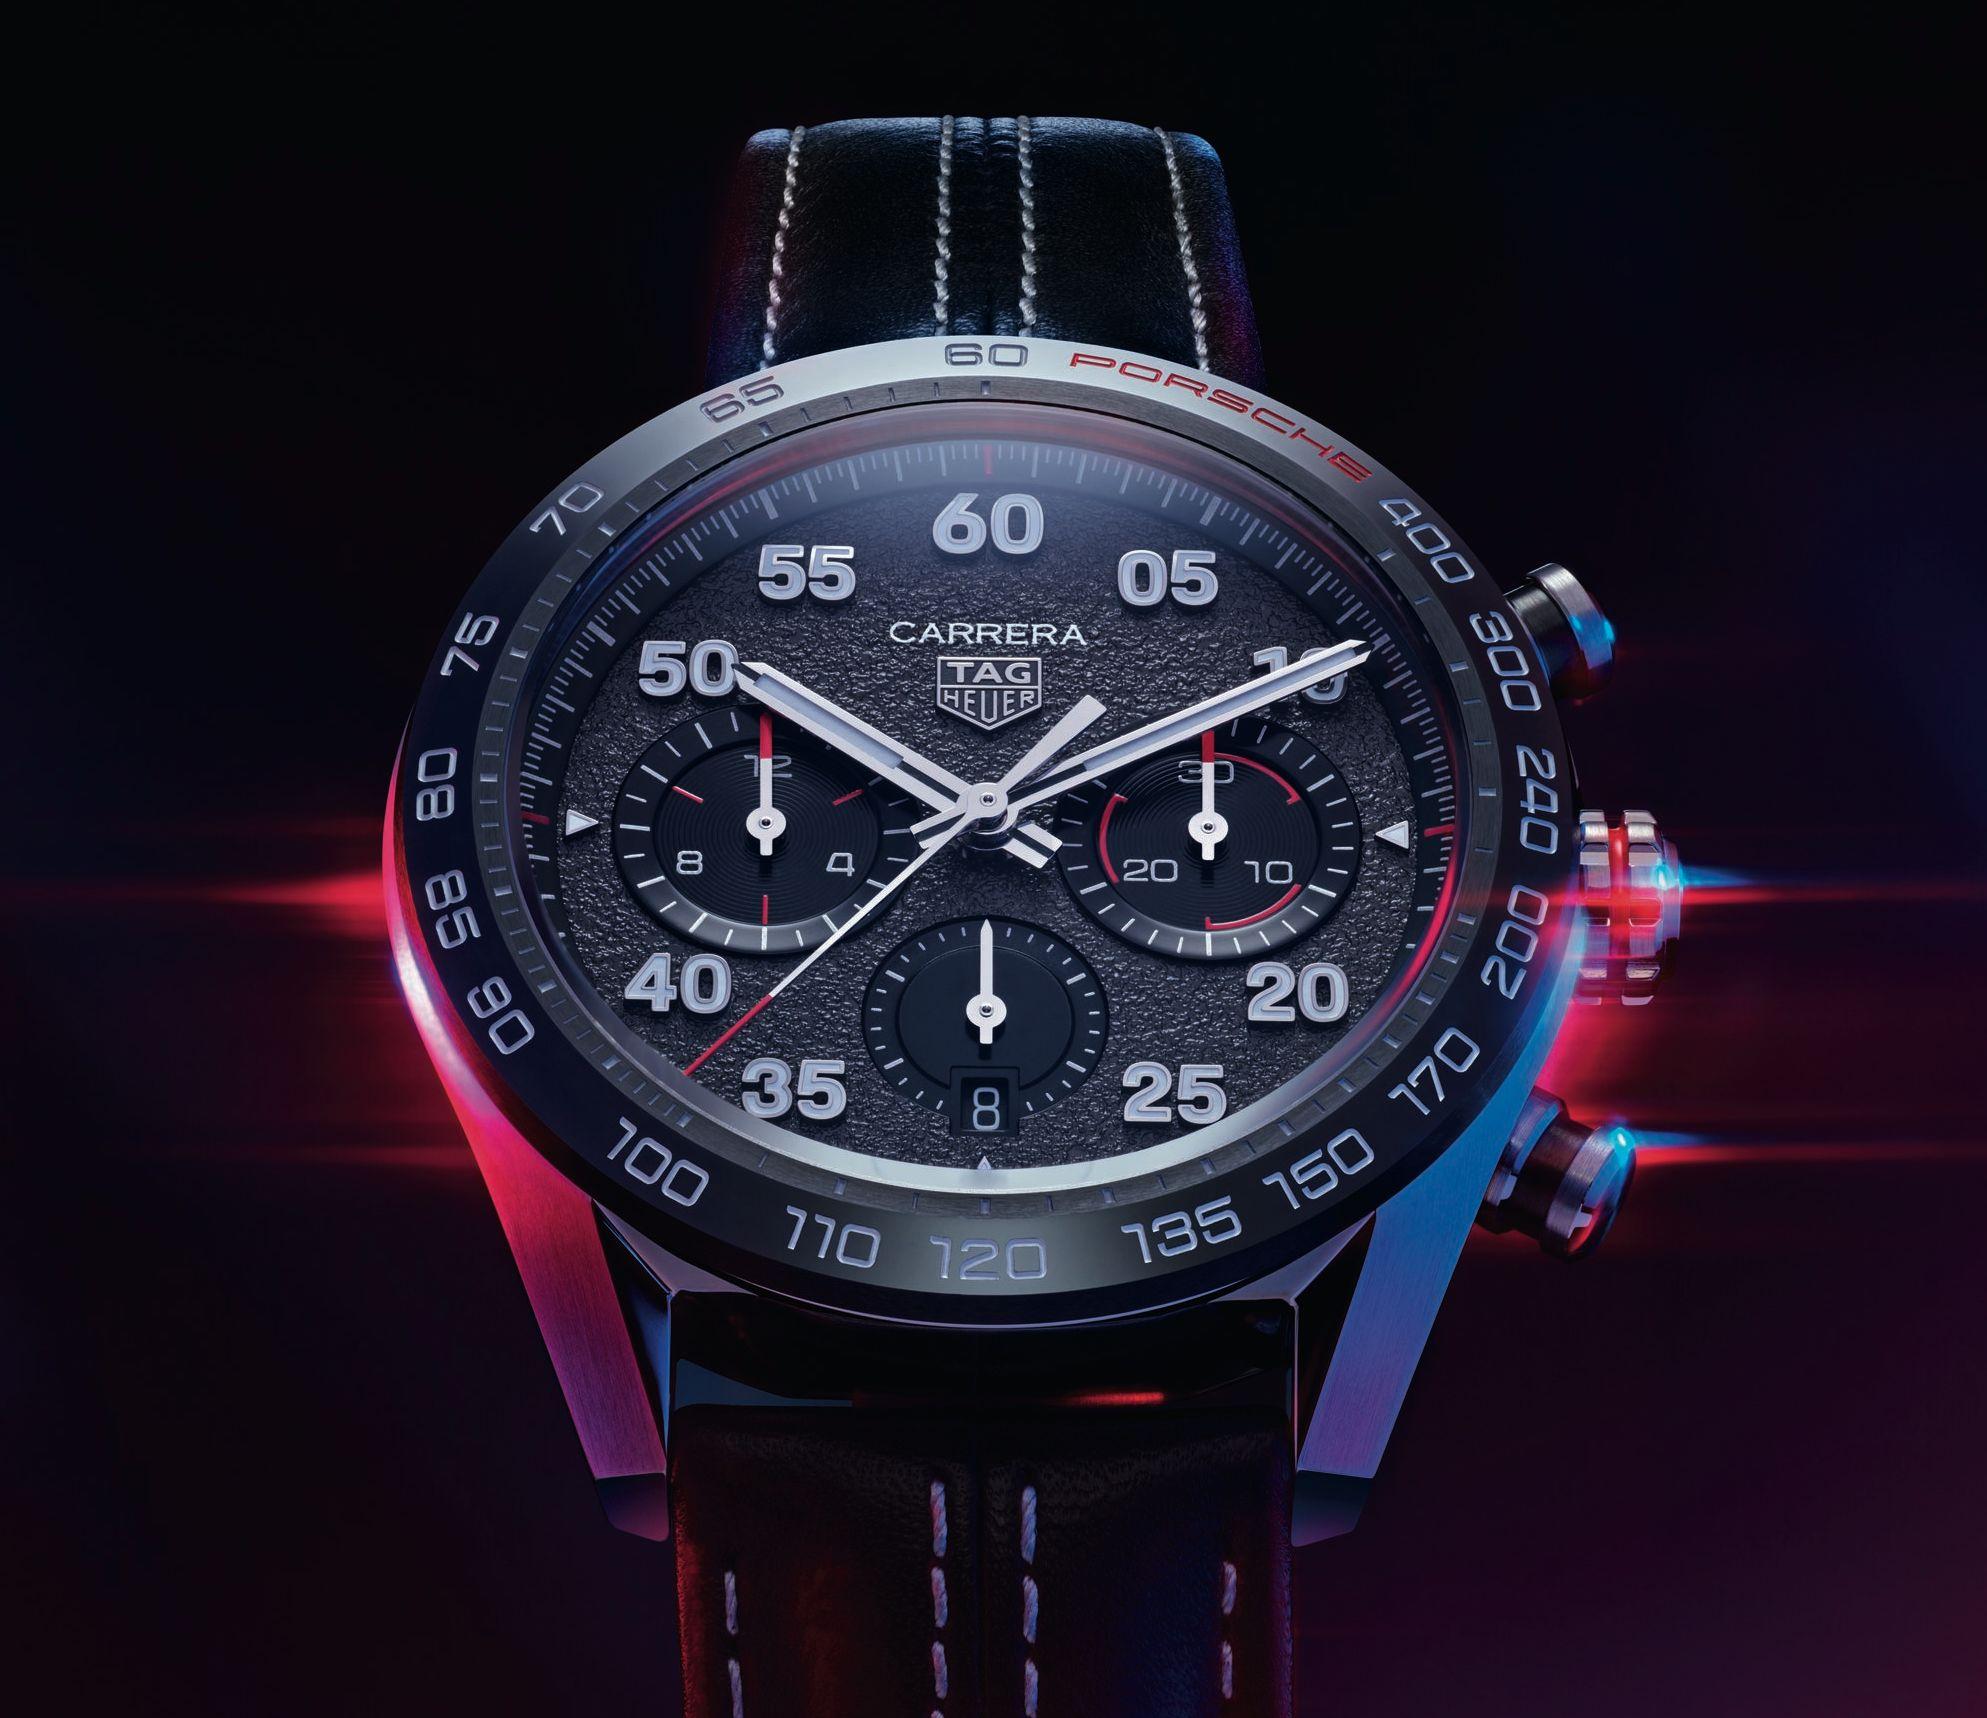 TAG Heuer Carrera Porsche Chronograph Special Edition